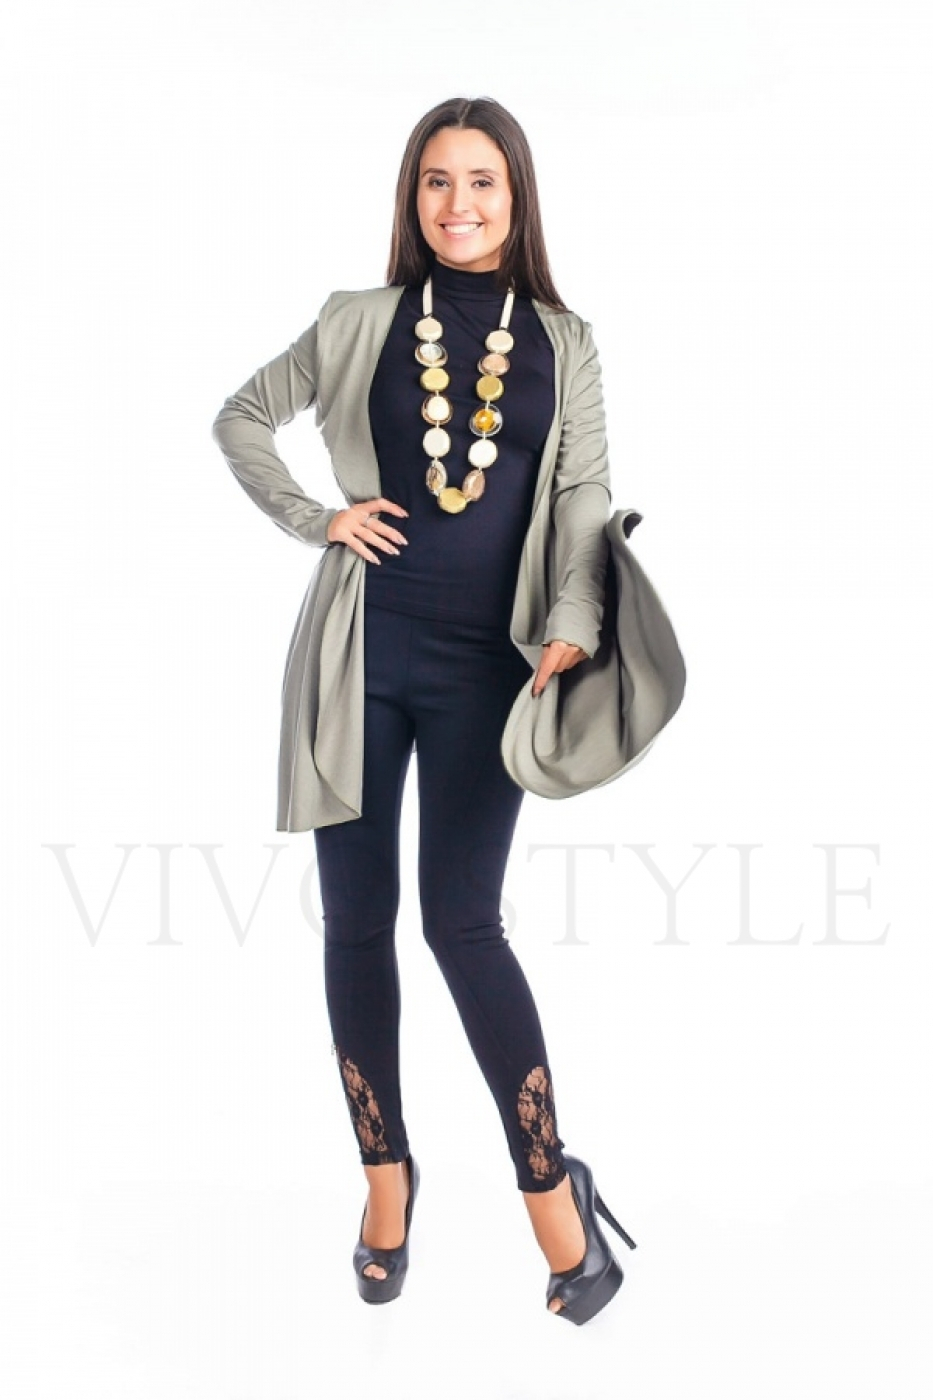 пошитый на фабрике Vivo-fashion кардиган